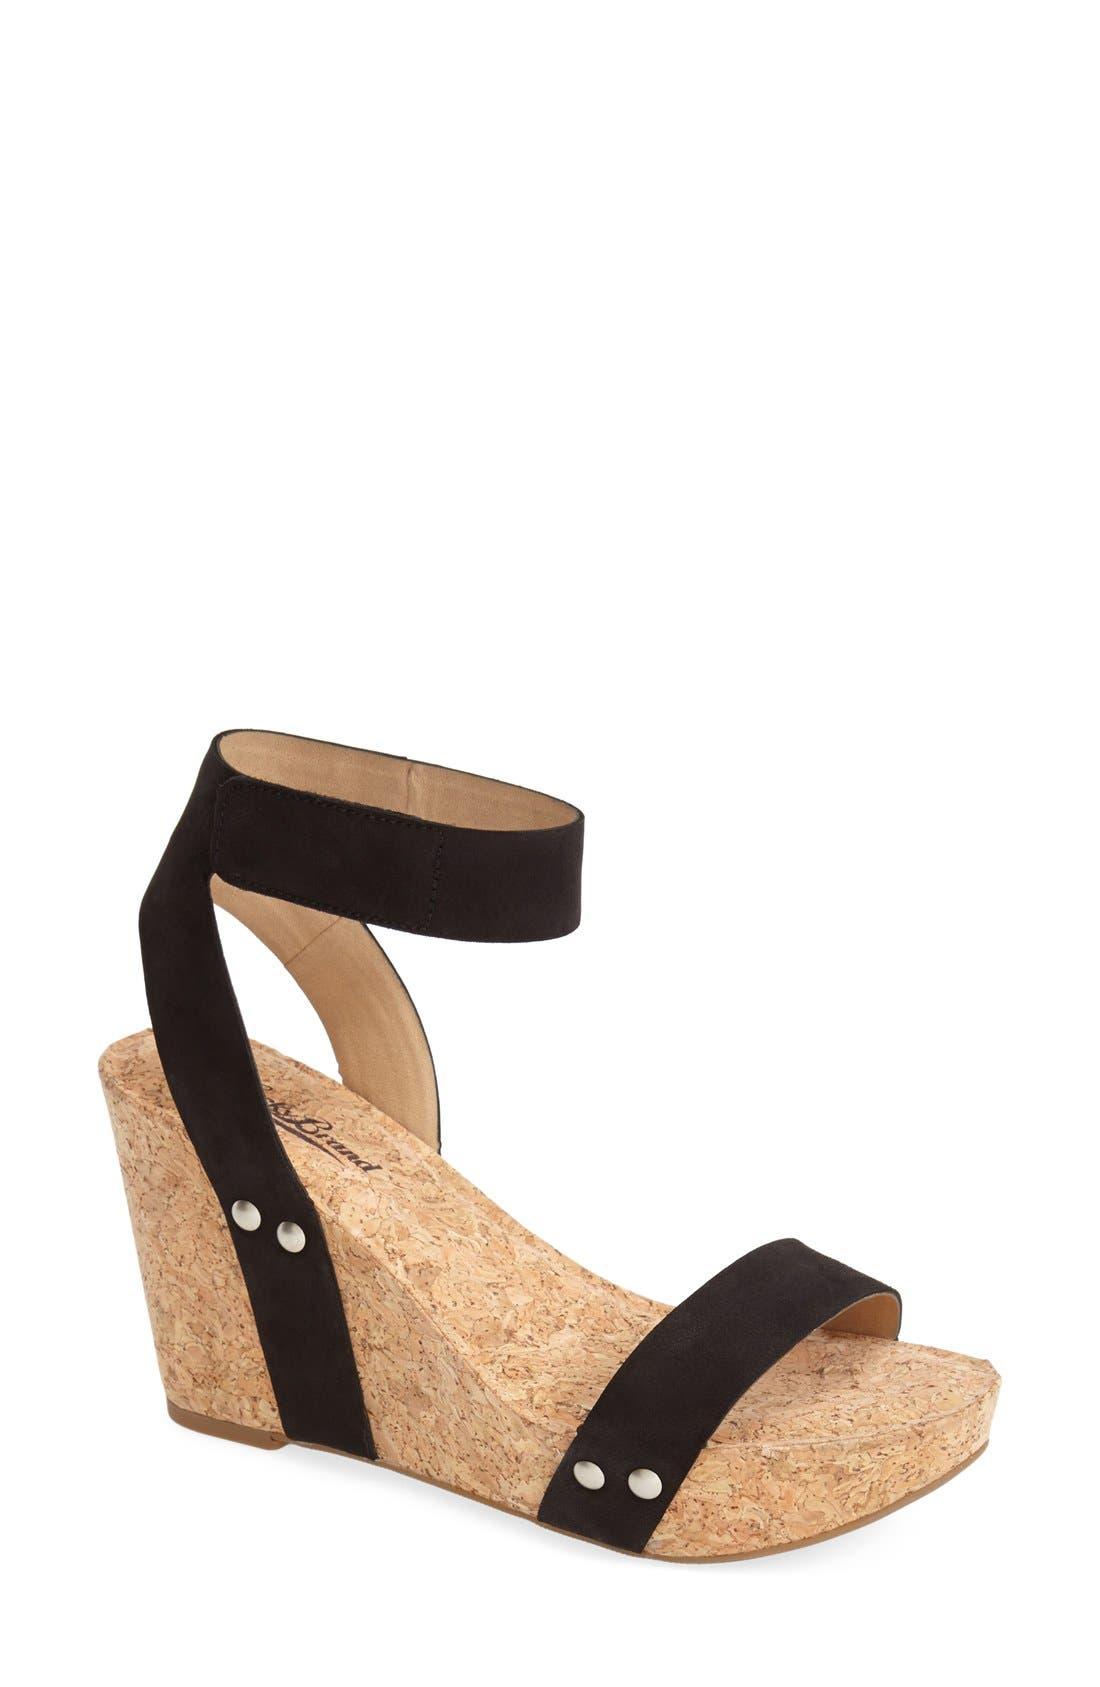 Main Image - Lucky Brand 'McDowell' Wedge Sandal (Women)